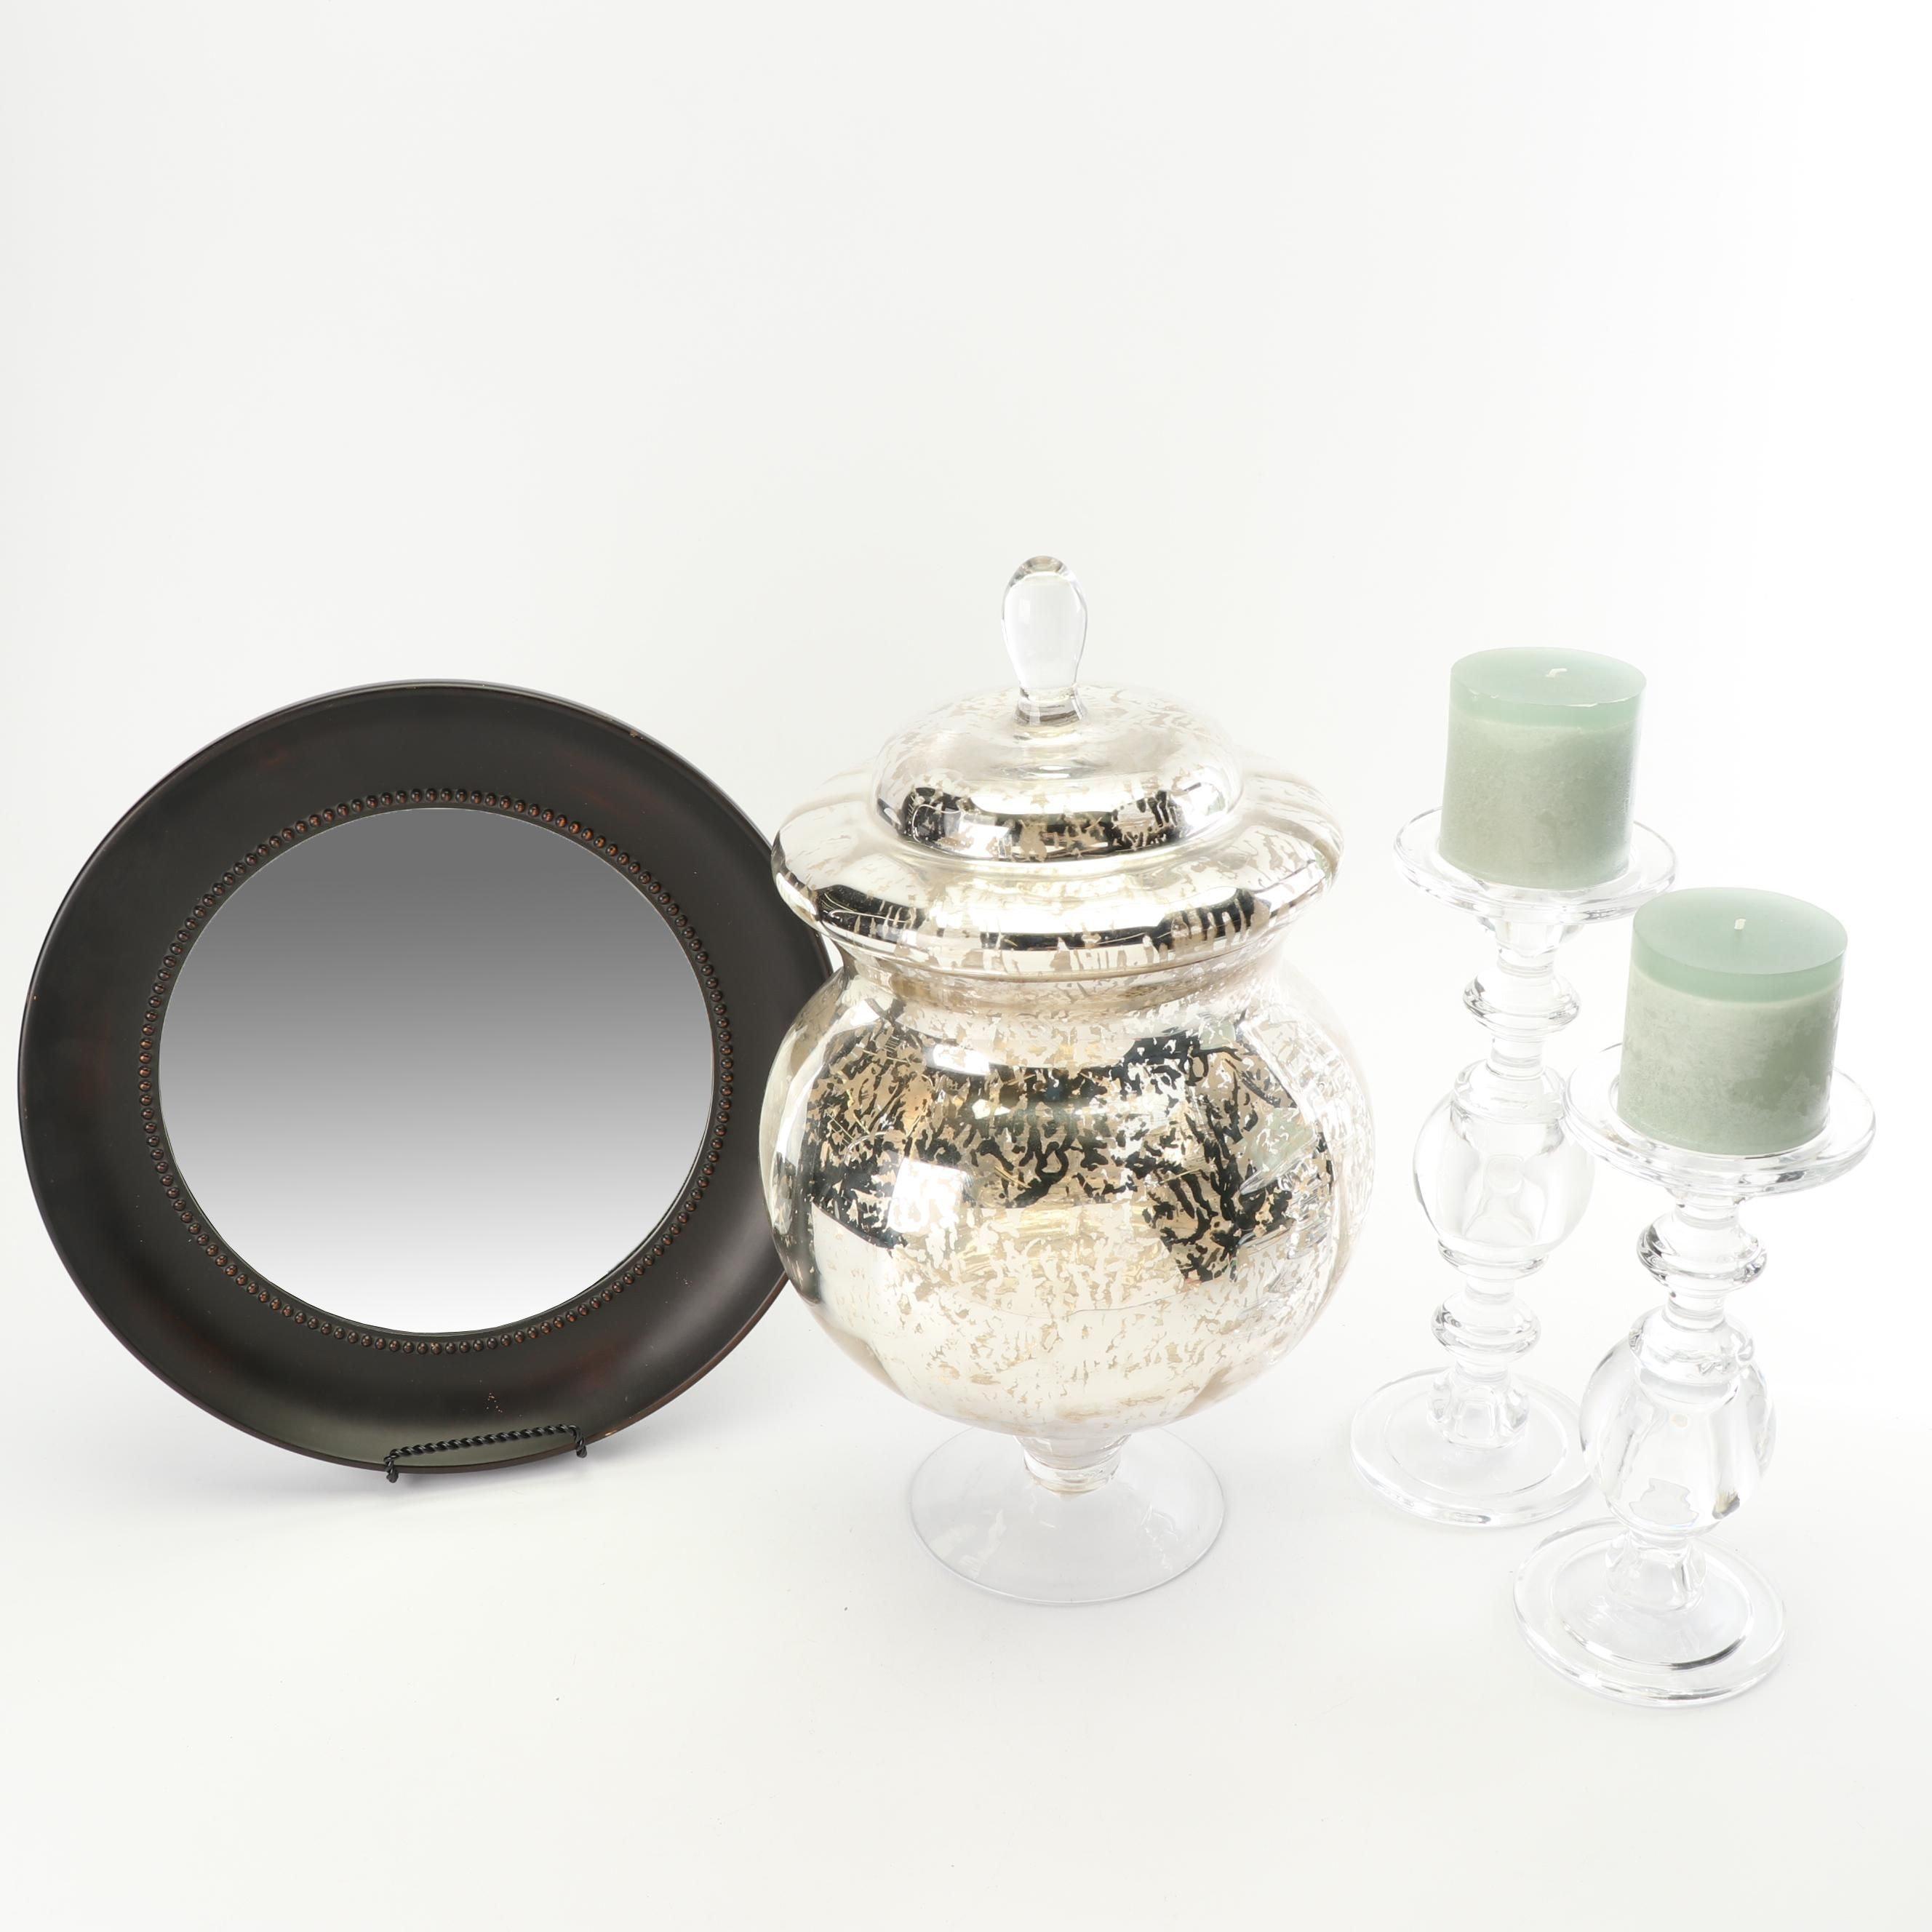 Pier 1 Mercury Glass Jar with Wall Mirror and Pillar Candlesticks